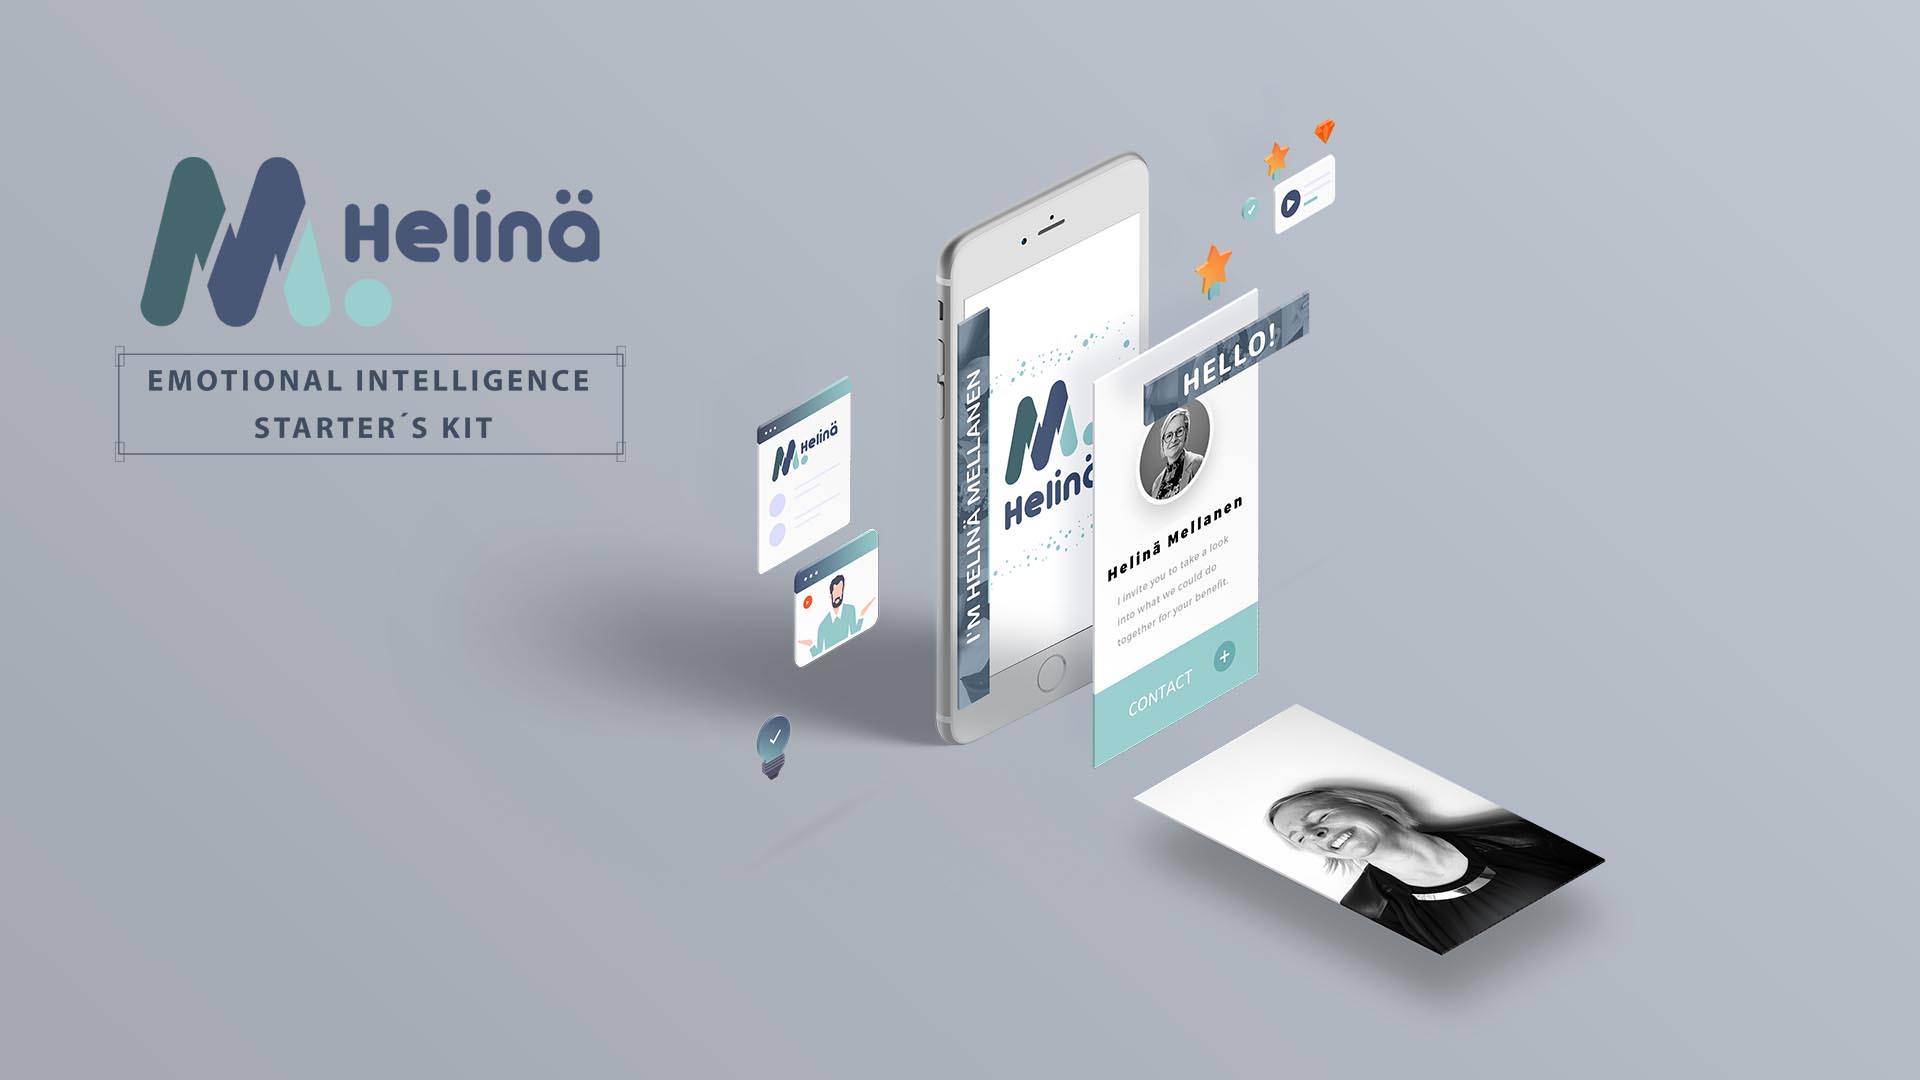 Emotional Intelligence with Helinä Mellanen